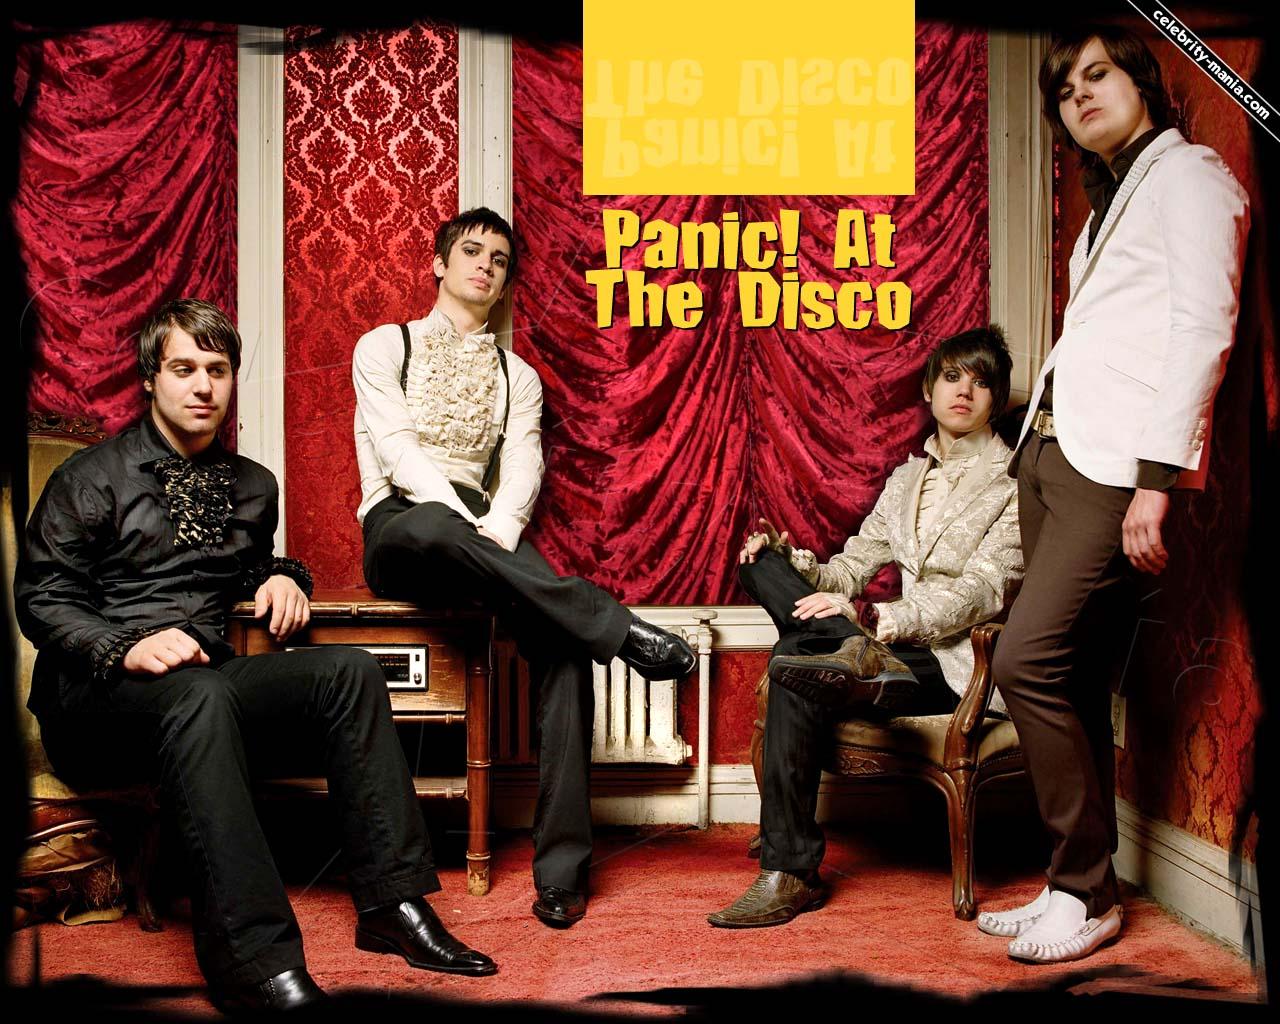 Rio De La Rocha Panic at The Disco Wallpapers 1280x1024